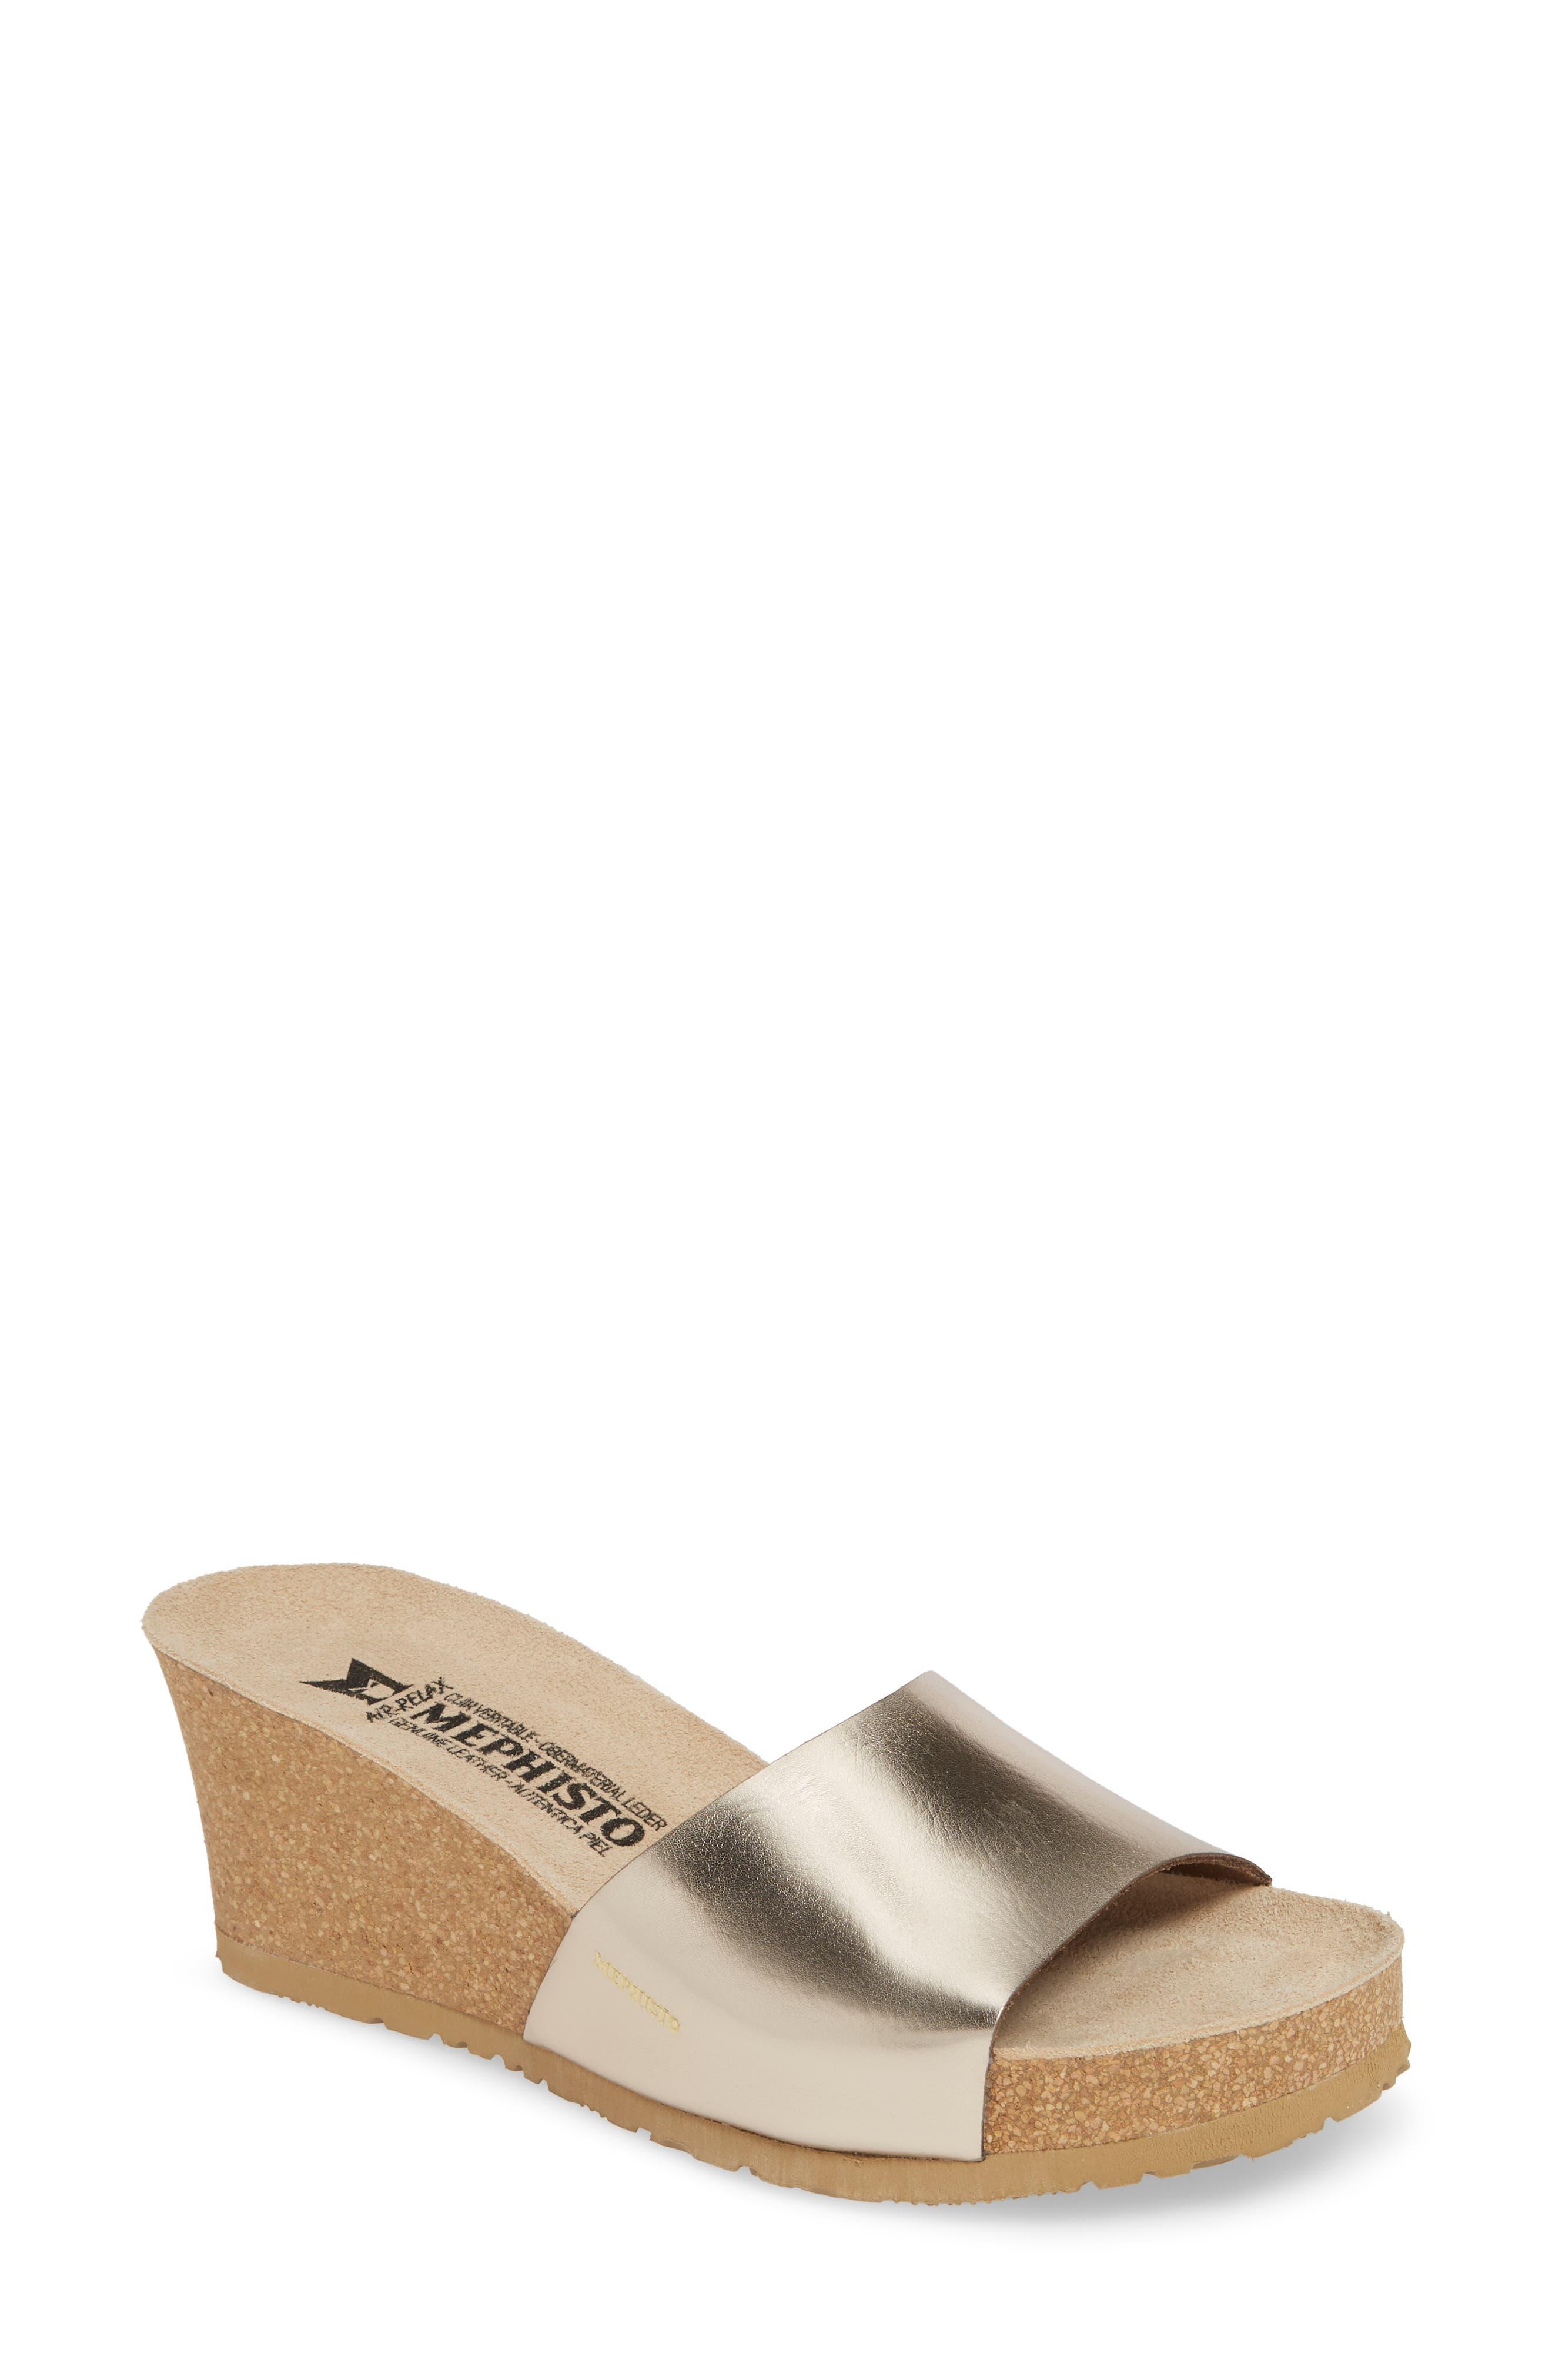 MEPHISTO Lise Platform Wedge Sandal, Main, color, PLATINUM LEATHER